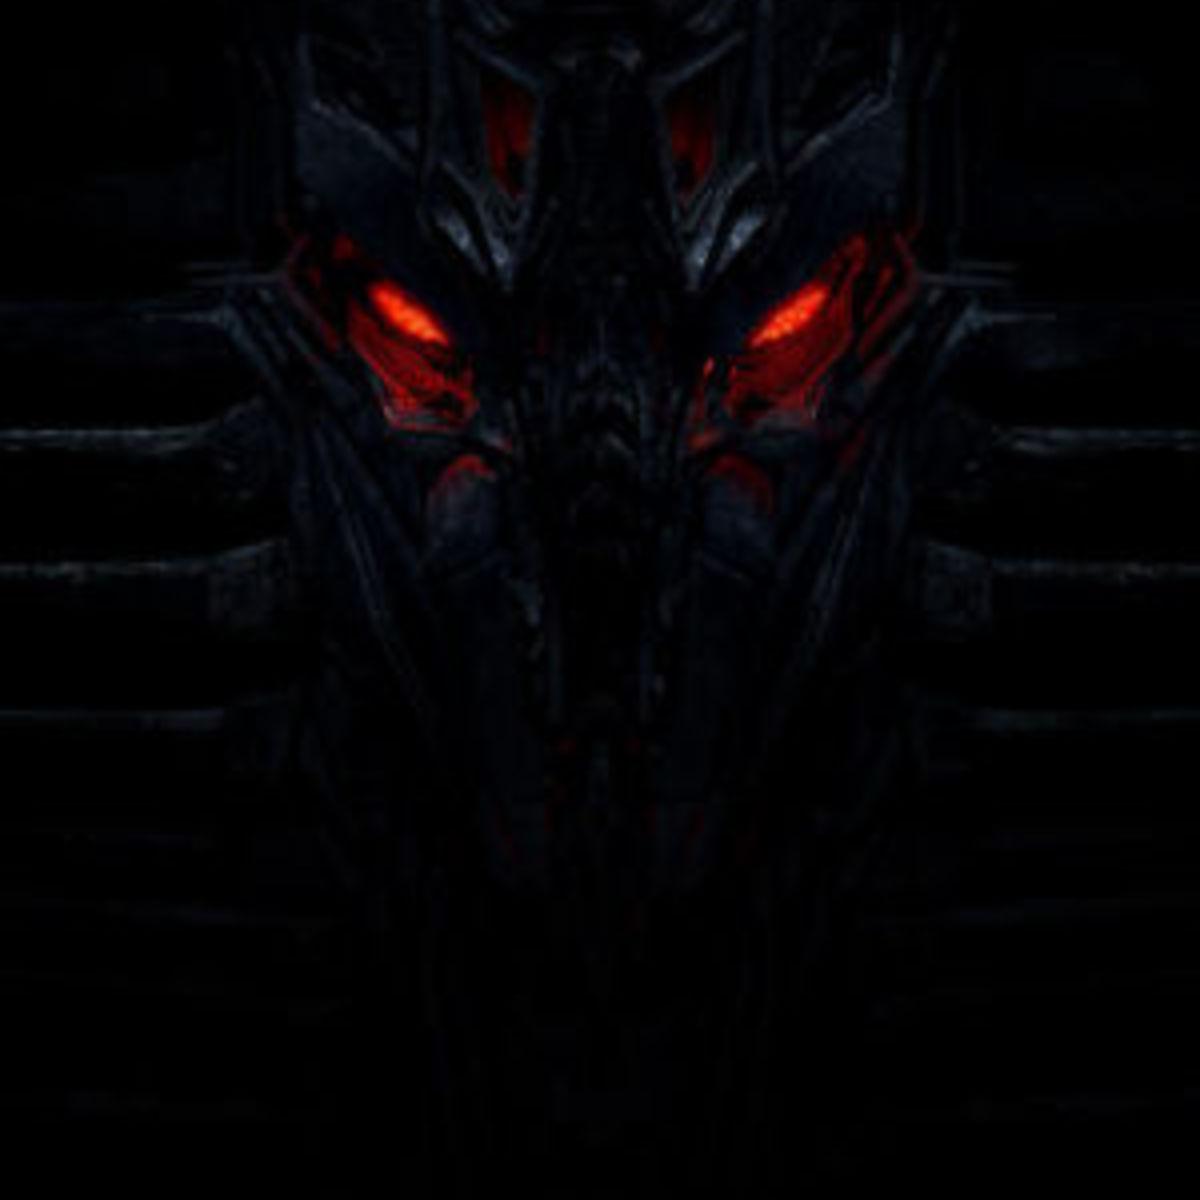 transformers_revengeofthefallen_pos_0.jpg